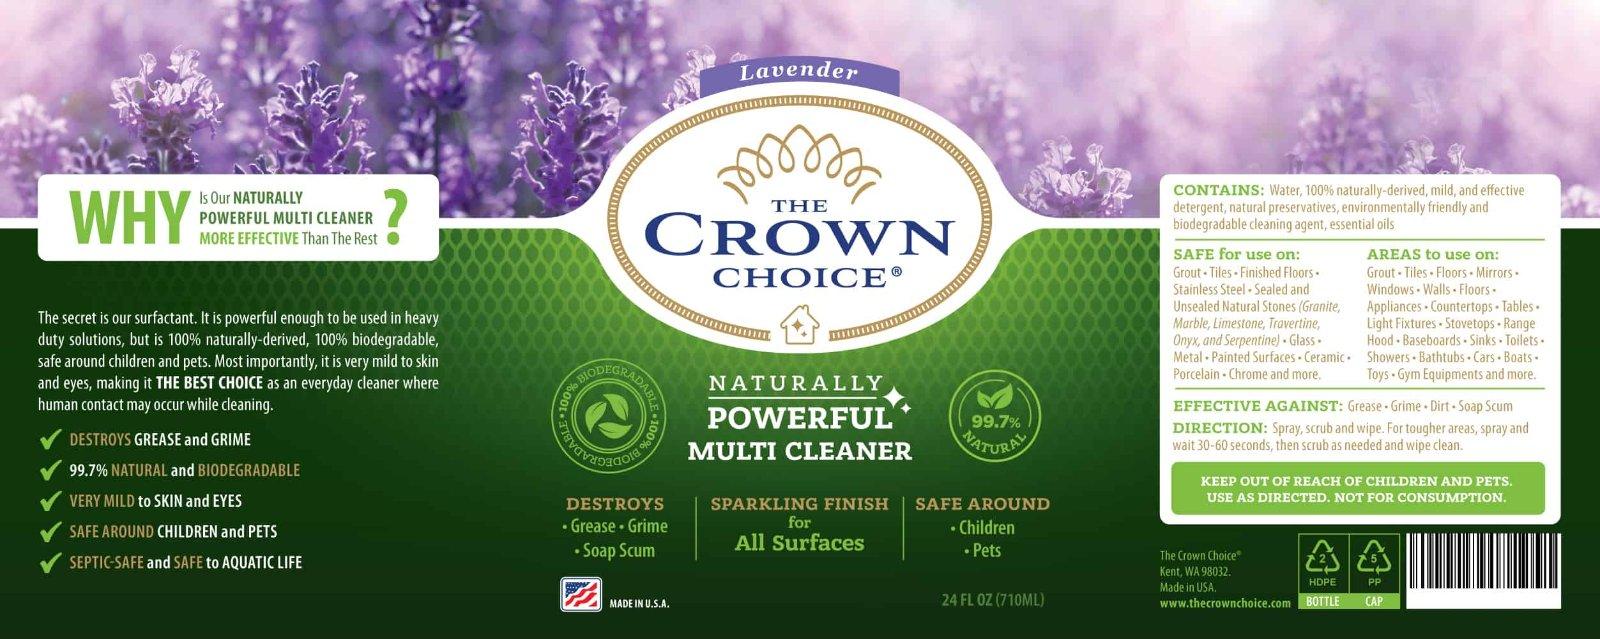 Lavender Multi Purpose Cleaner -The Crown Choice Multi Purpose Cleaner 10